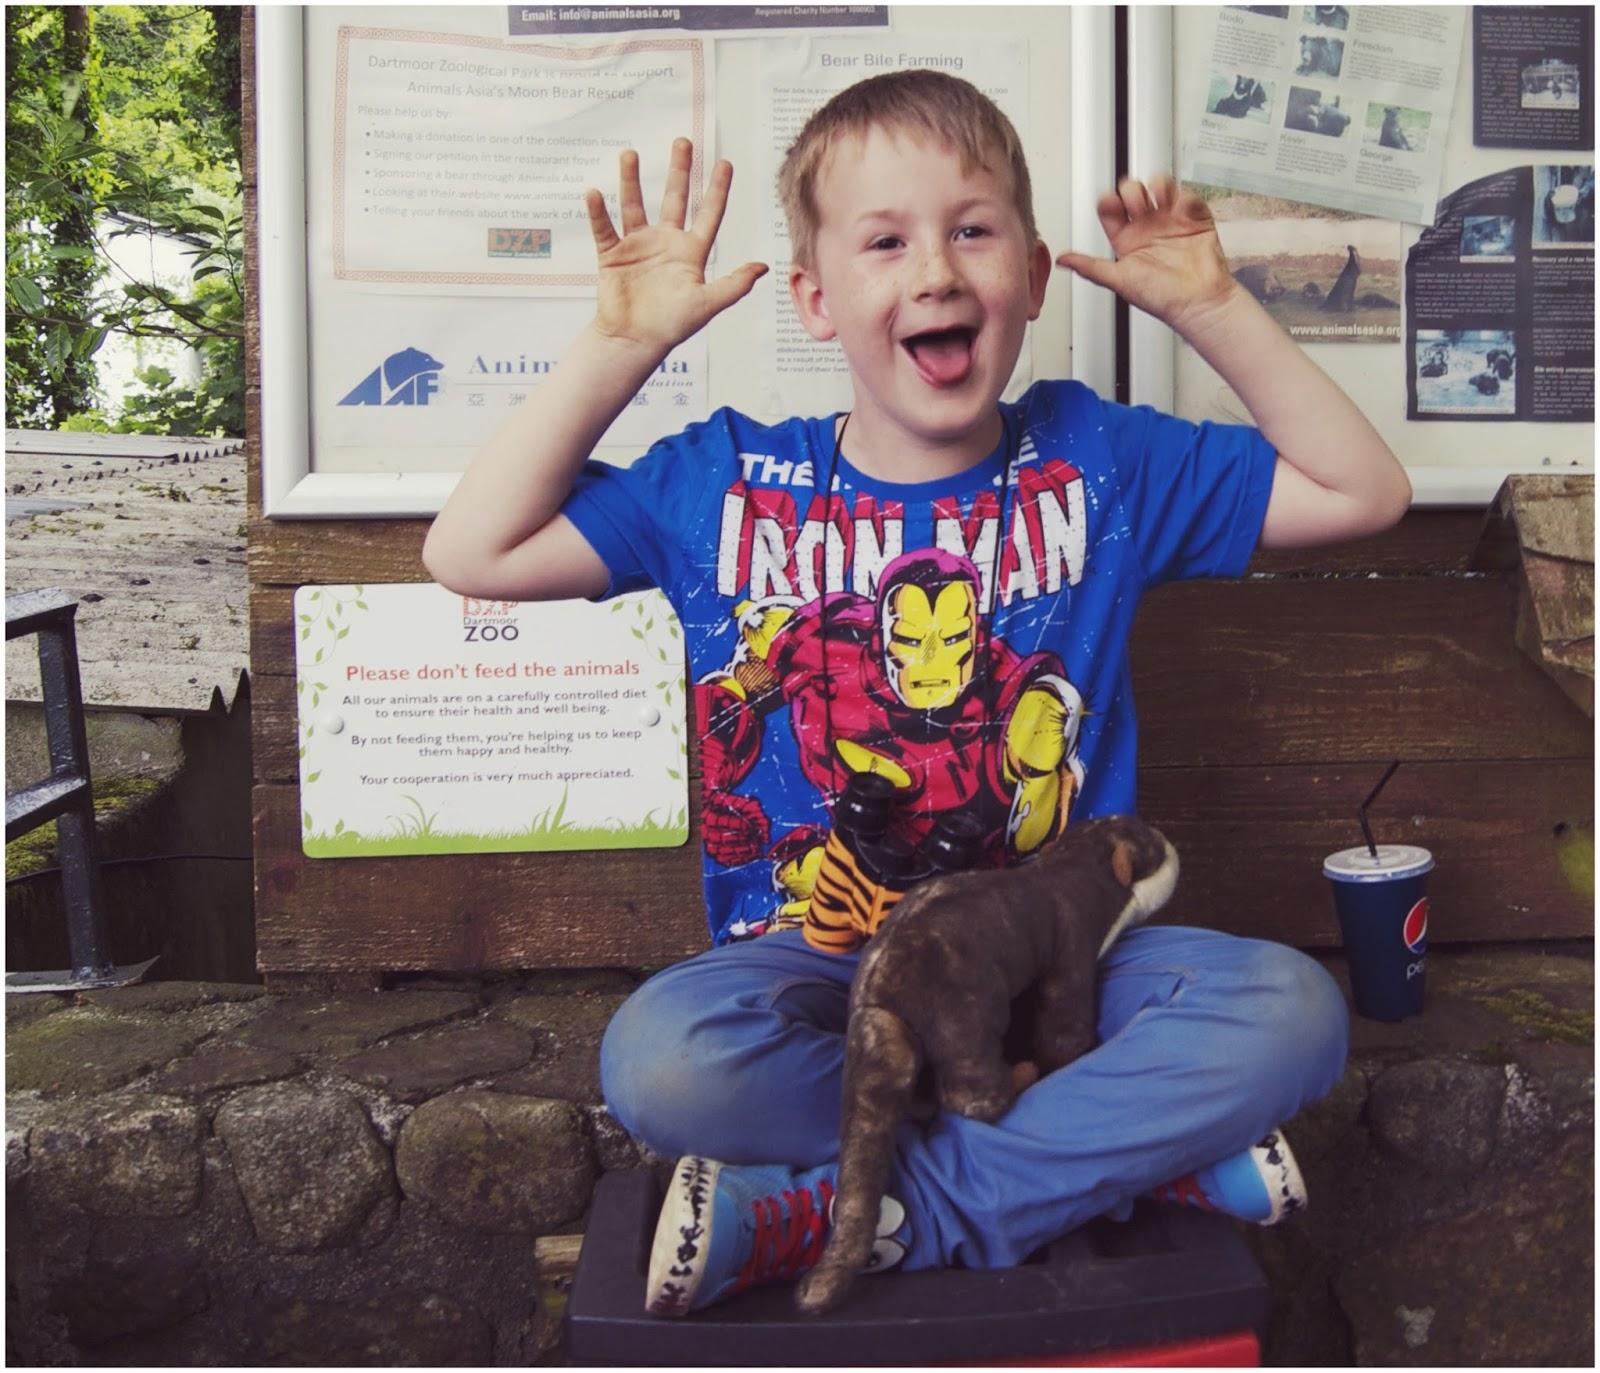 dartmoor zoo, bears, childhood, fun, lol, living arrows, photo, blogger, plymouth bloggers,